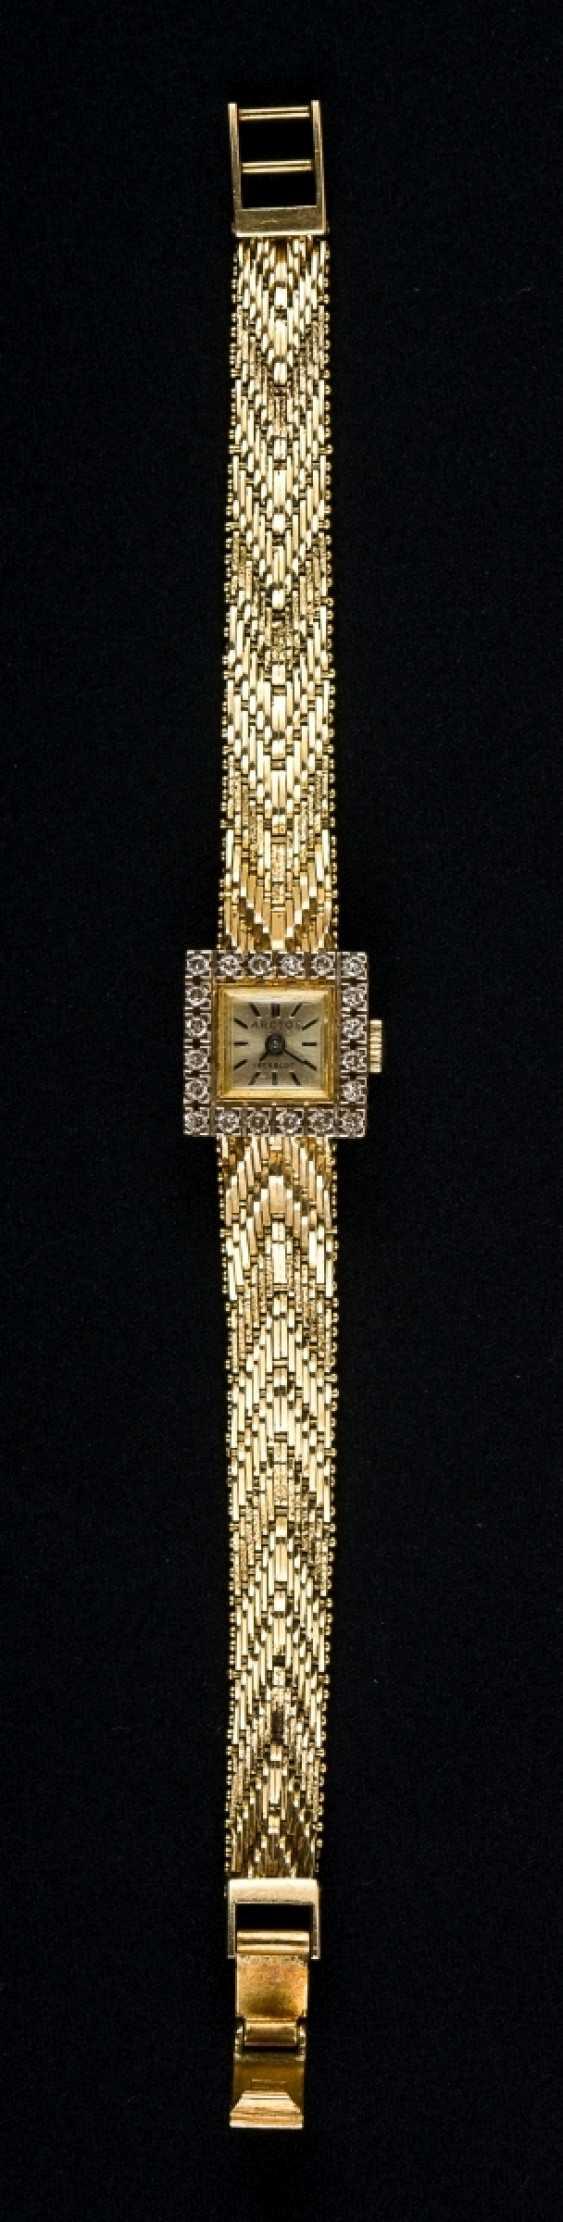 Golden ladies wrist watch with diamonds-trim - photo 1